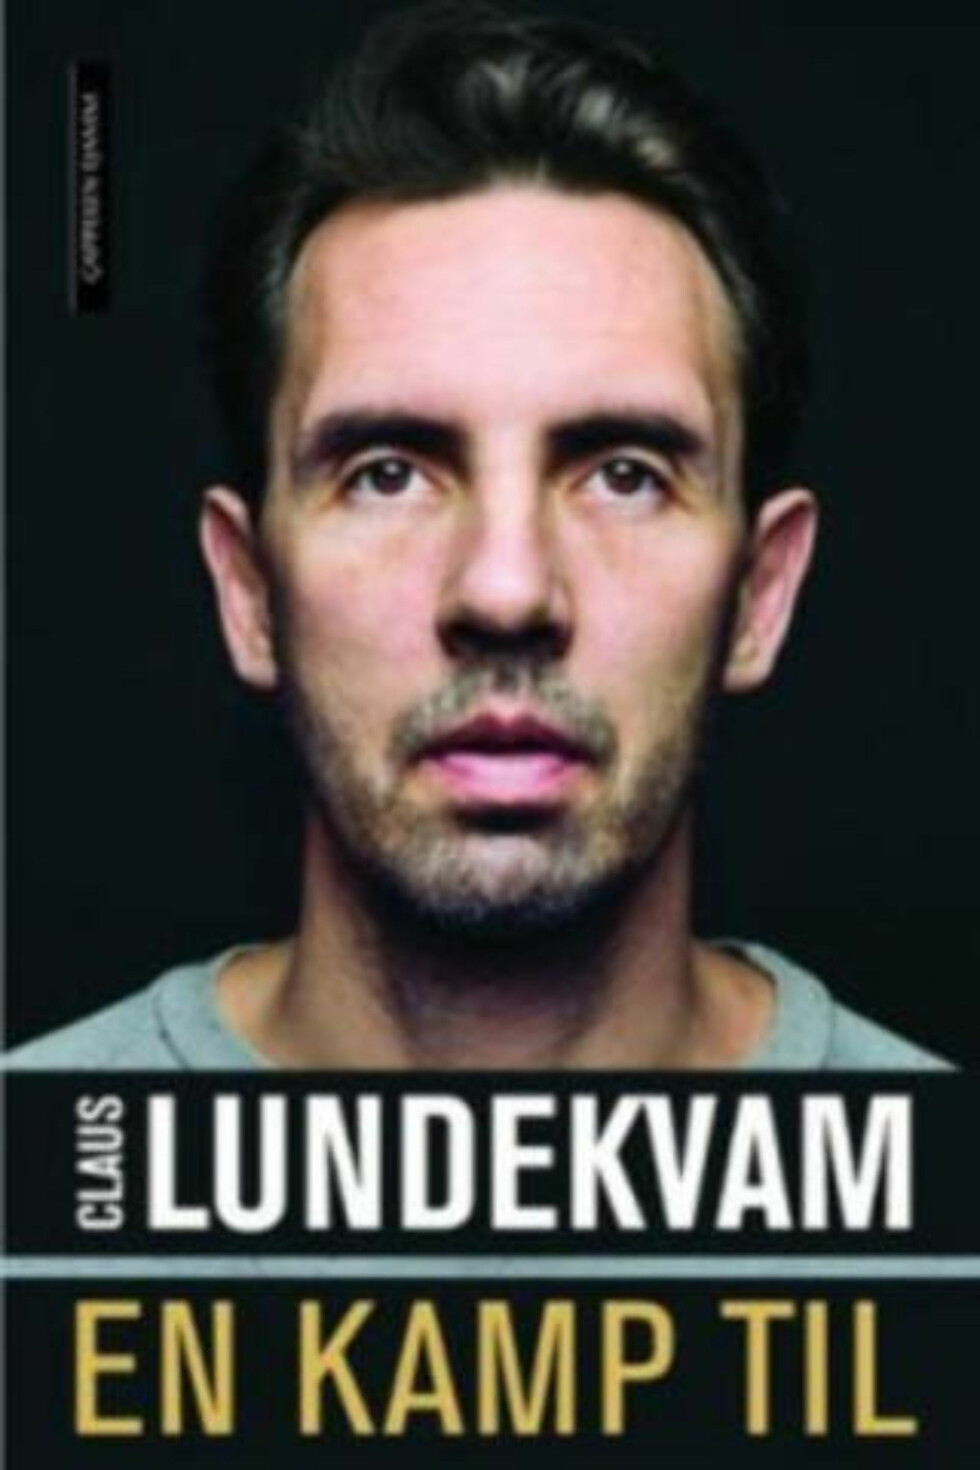 NY BOK: Claus Lundekvams biografi er i salg fredag.